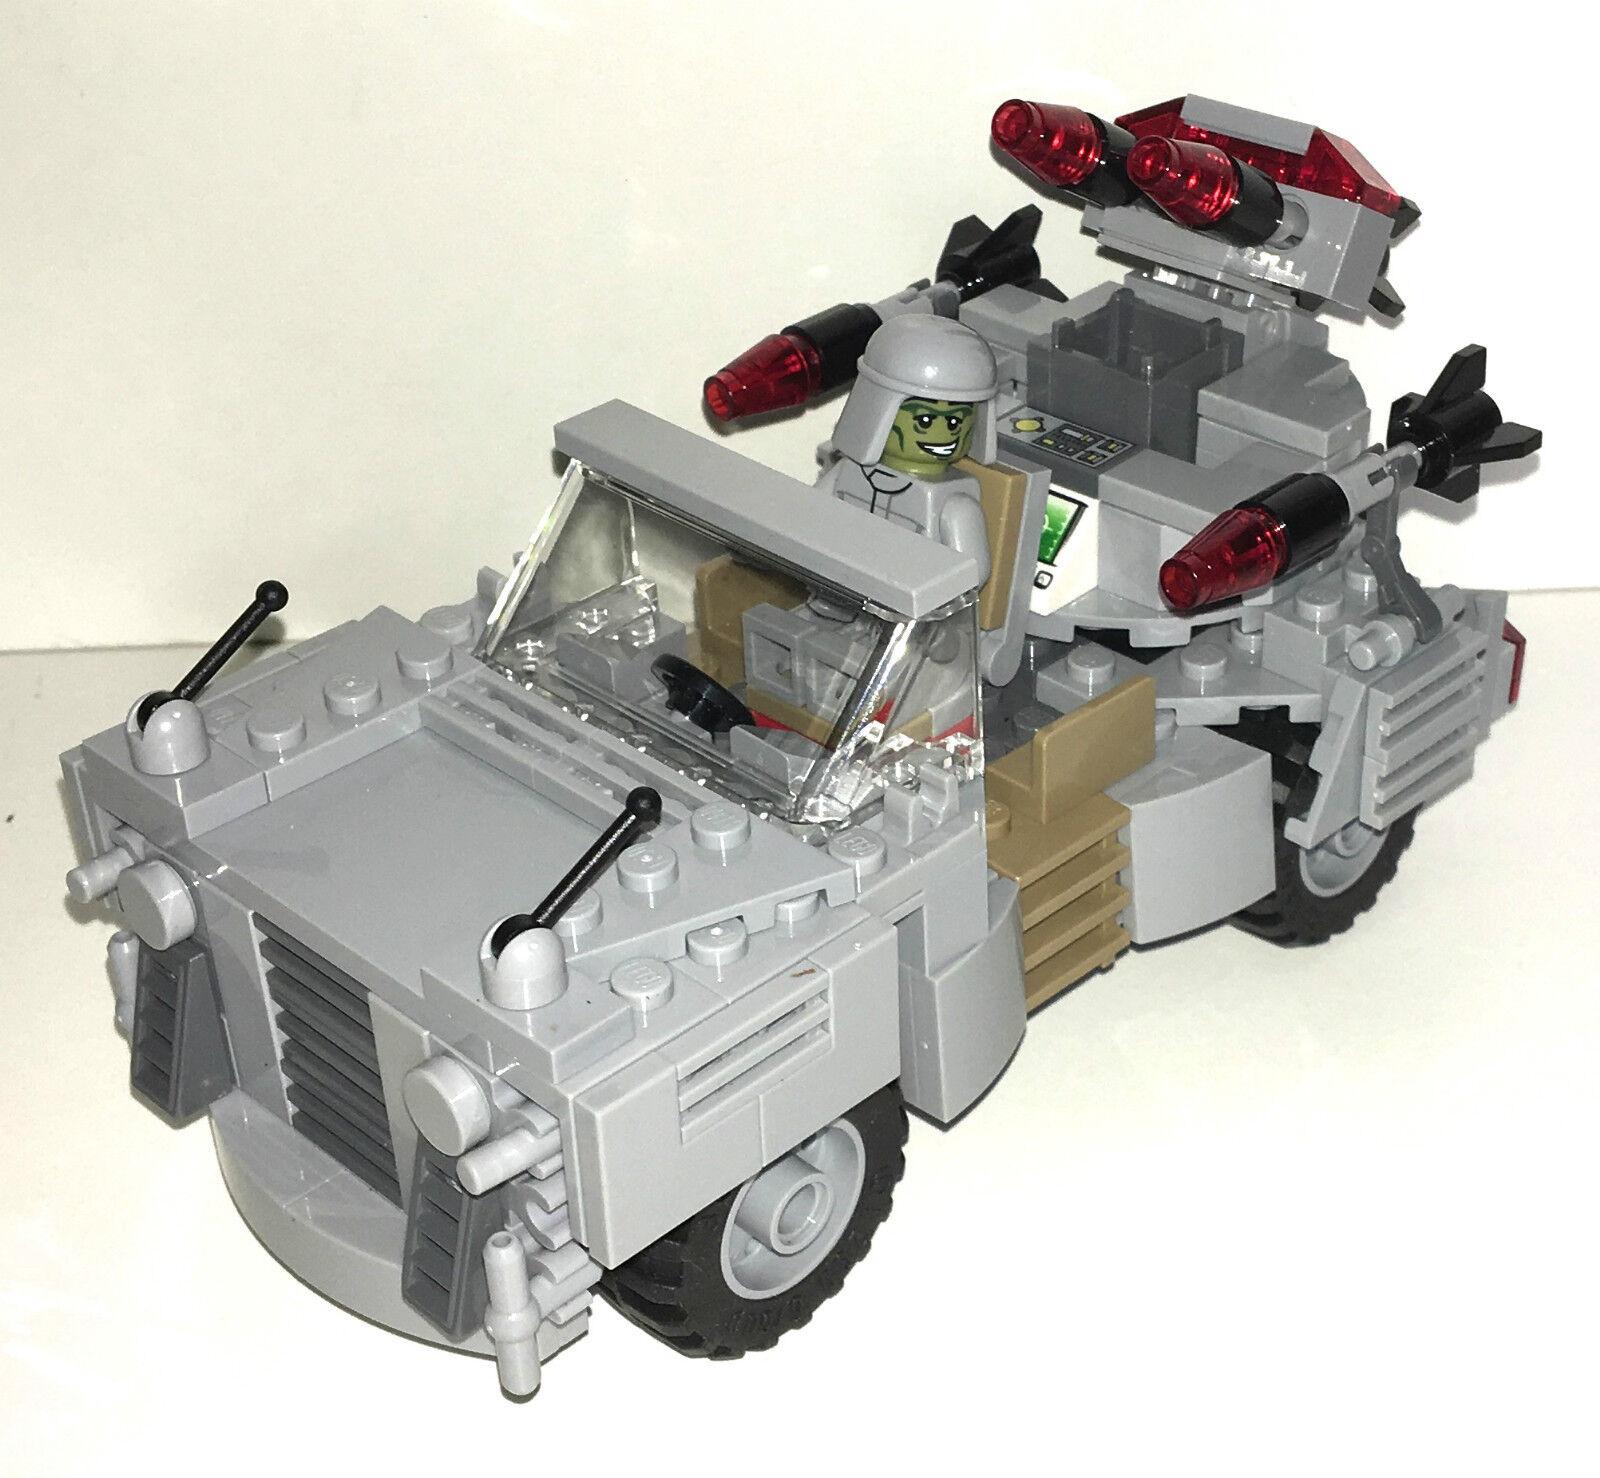 Original LEGO NEW PARTS - - - ROCKET LAUNCHER MAD MAX CAR CUSTOM VEHICLE my design 97f3b9